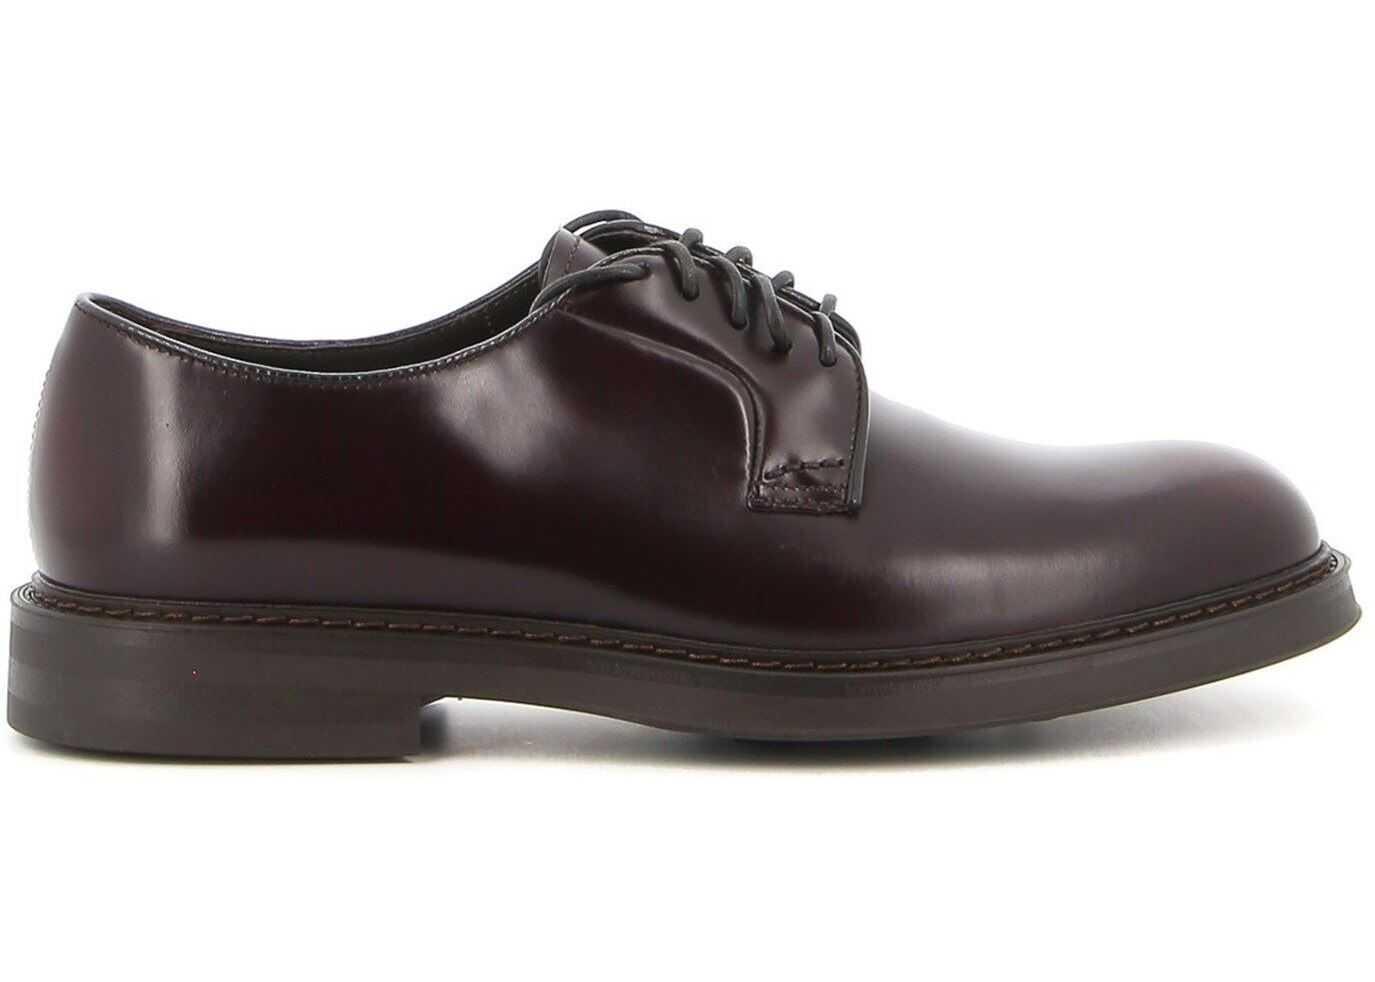 Doucal's Horse Calfskin Derby Shoes DU1385BRUGUF007TL01 Brown imagine b-mall.ro